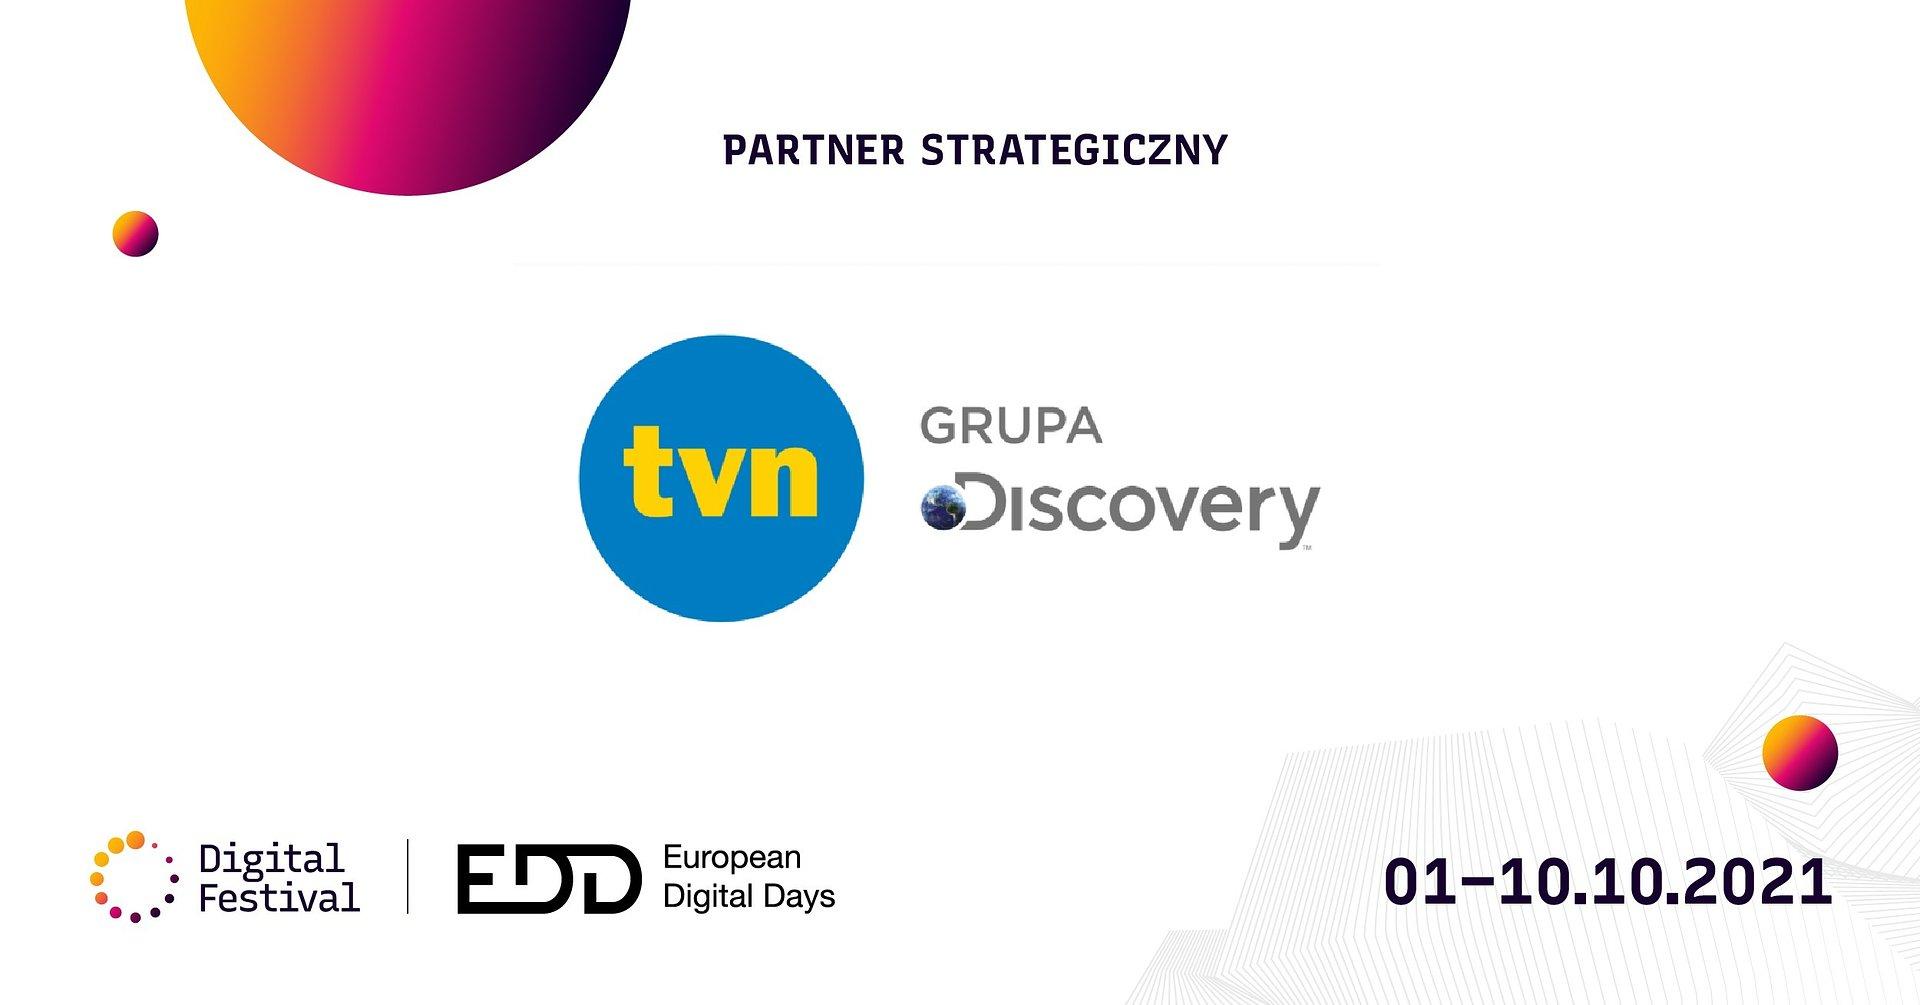 TVN Grupa Discovery zaprasza na 3. edycję Digital Festival